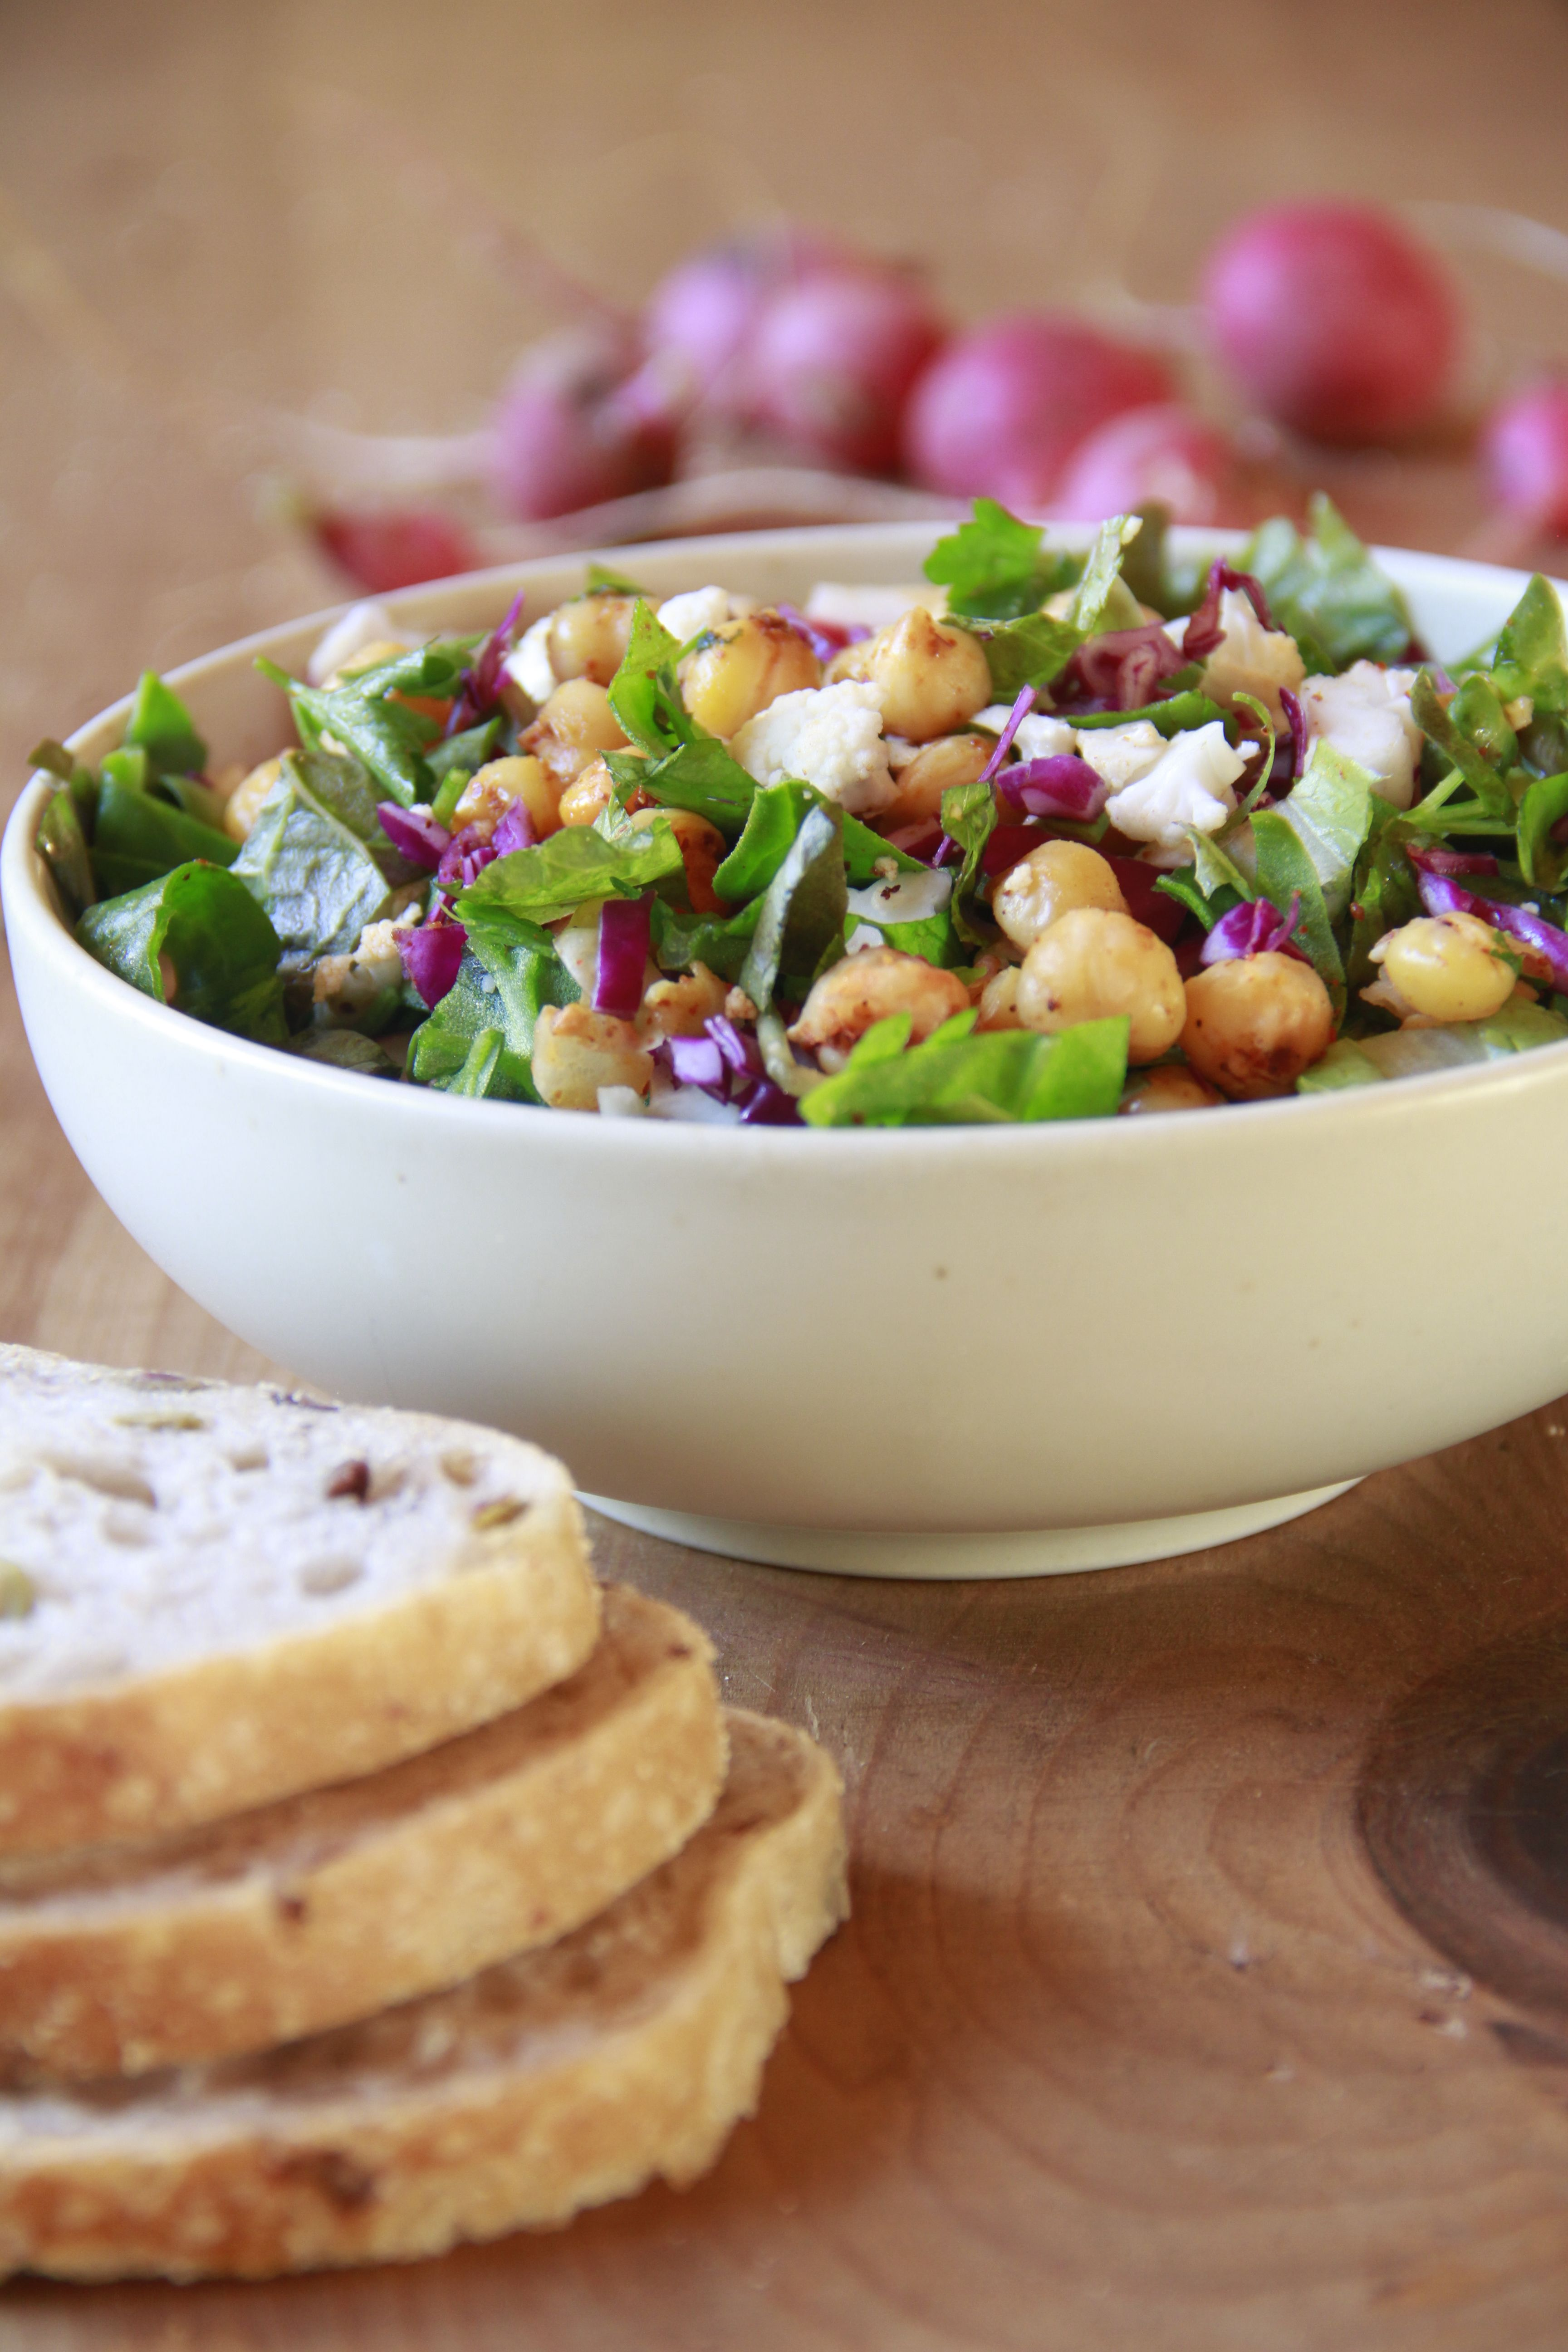 Garbanzo Beans And Cauliflower Salad Vegan Food Vegan